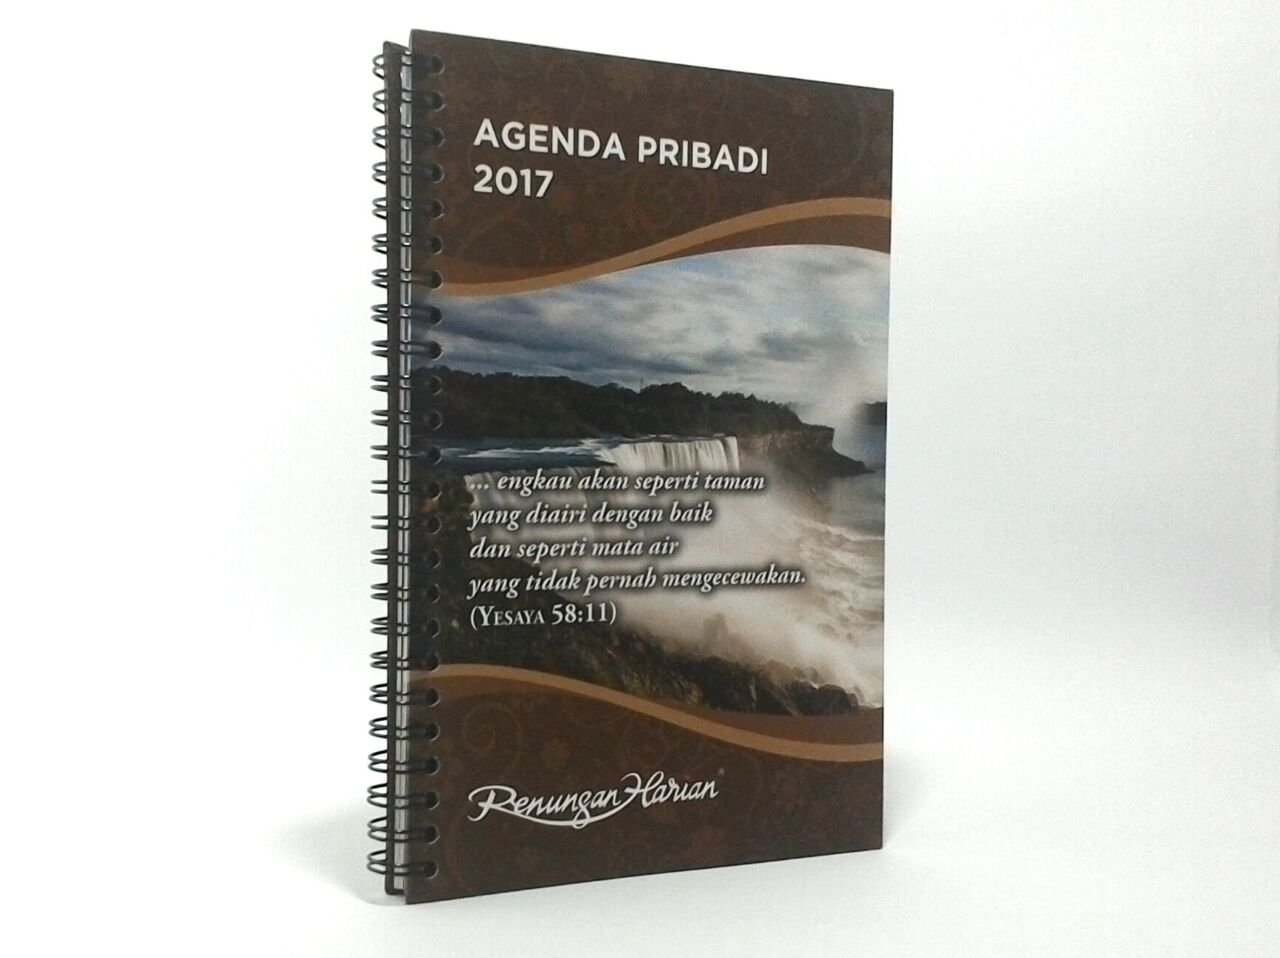 Agenda Pribadi 2017